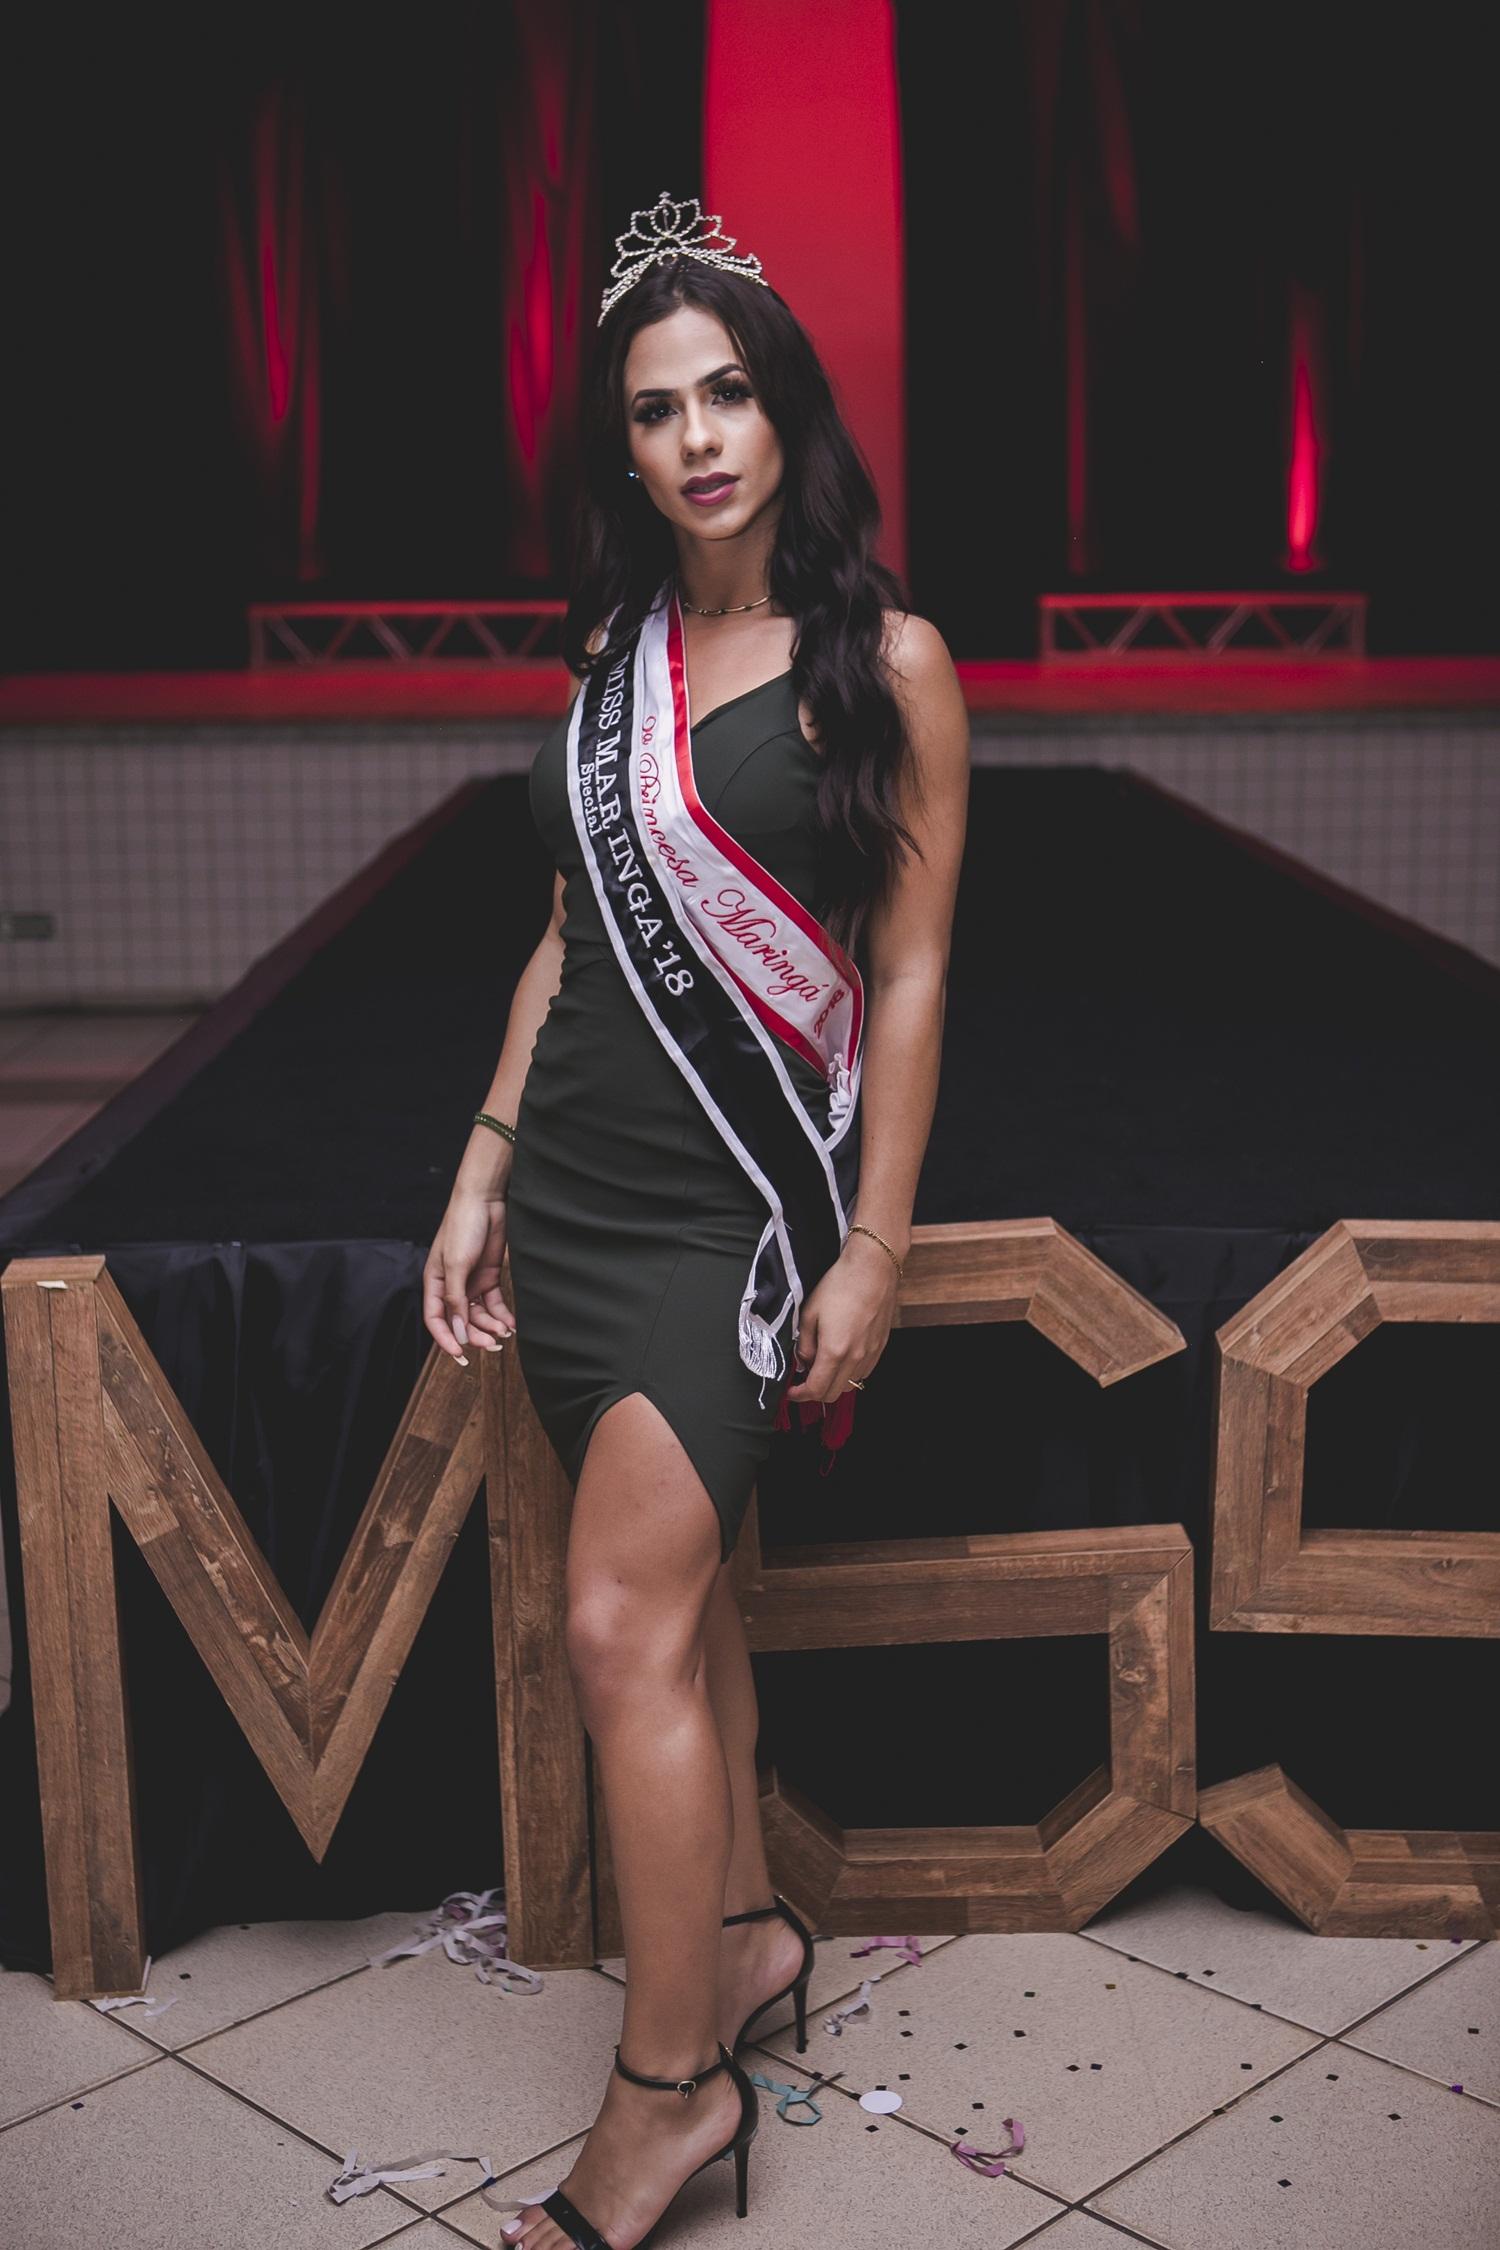 Miss 258